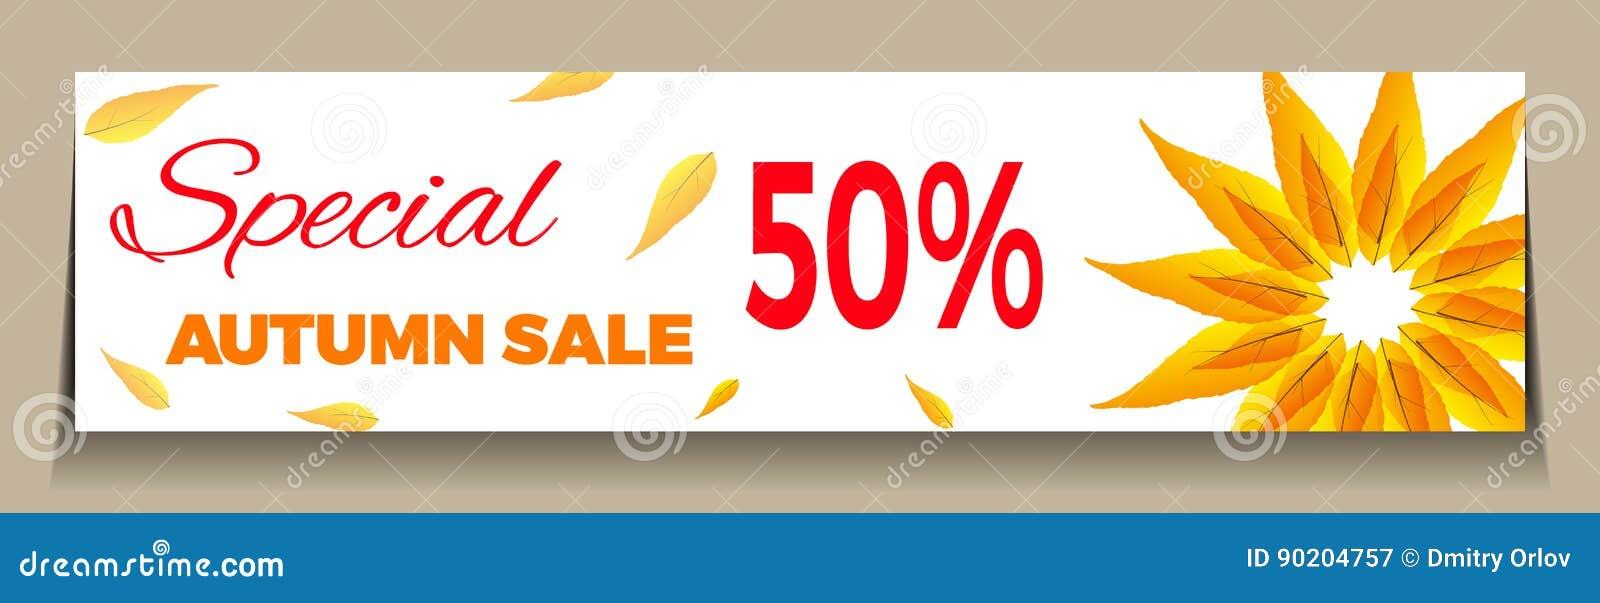 Big Autumn Sale Stock Illustration Image 90204757